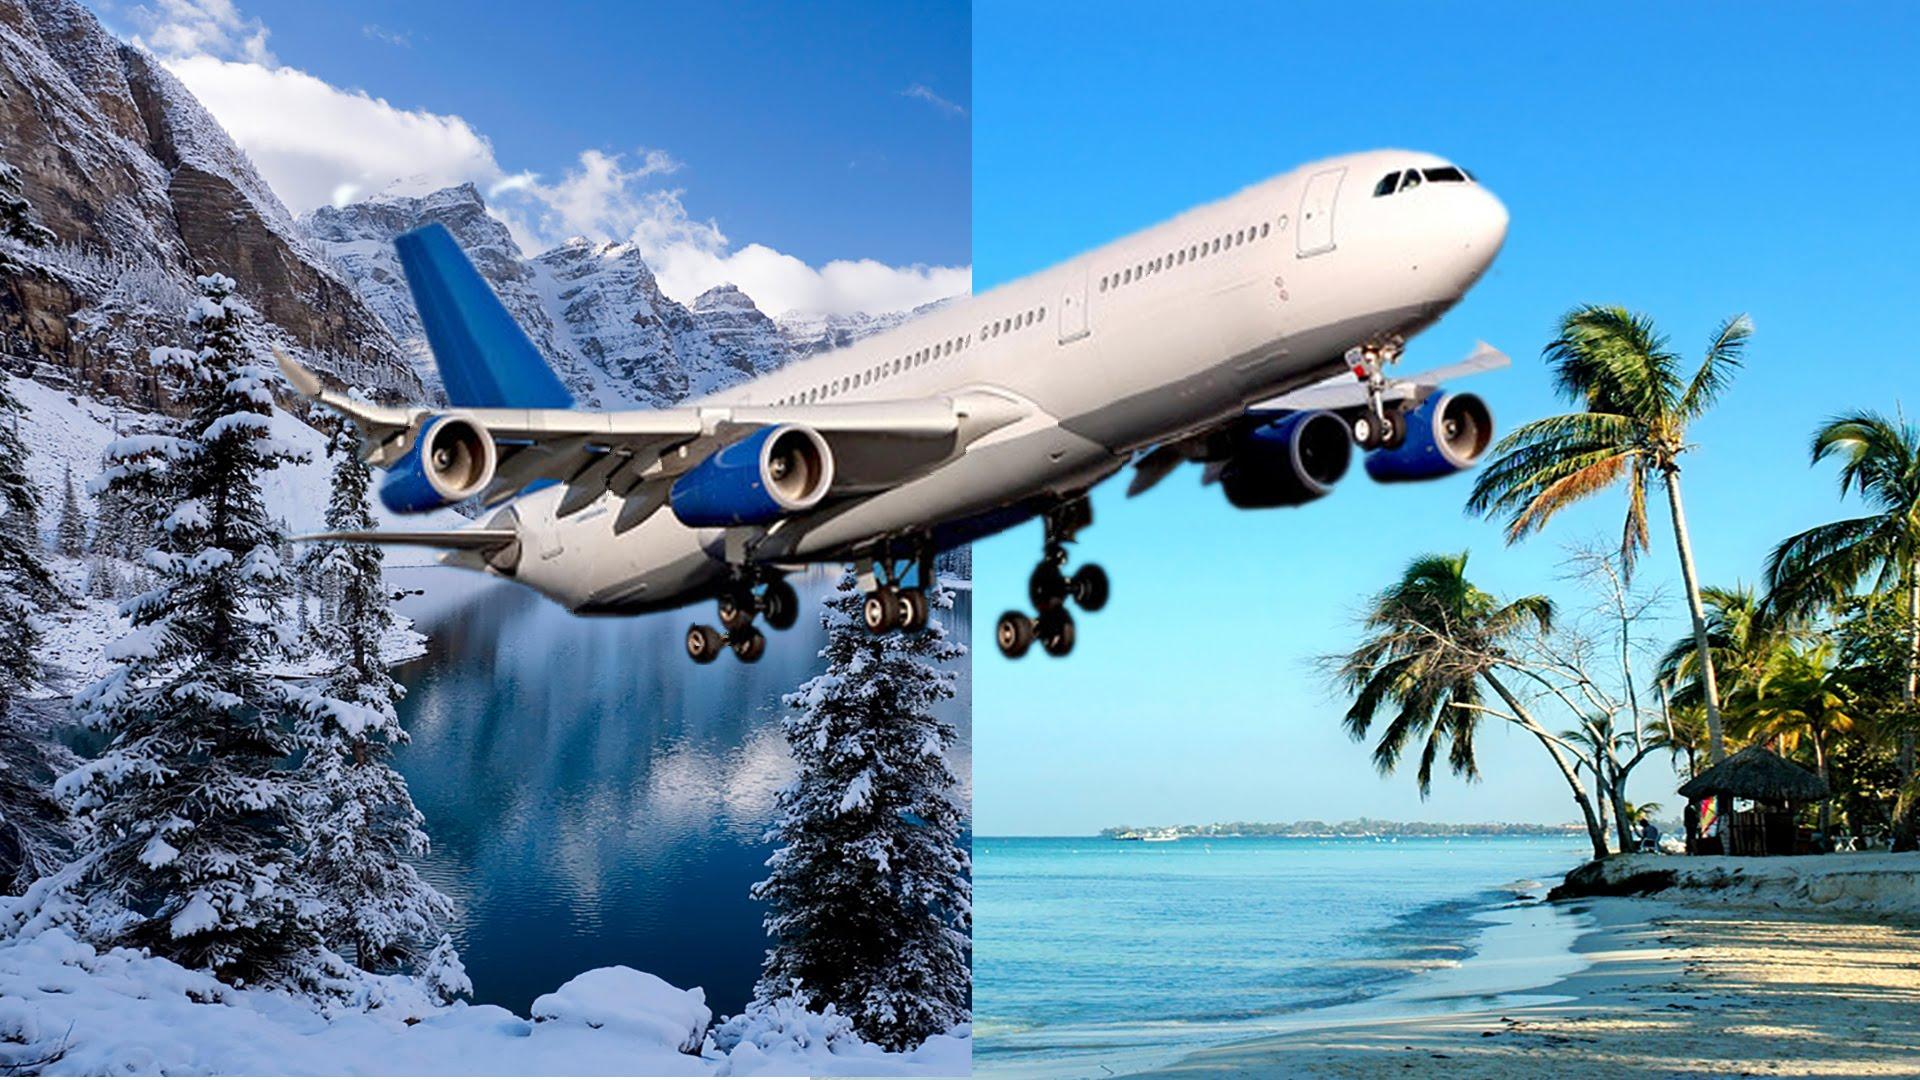 картинки самолетов в отпуске